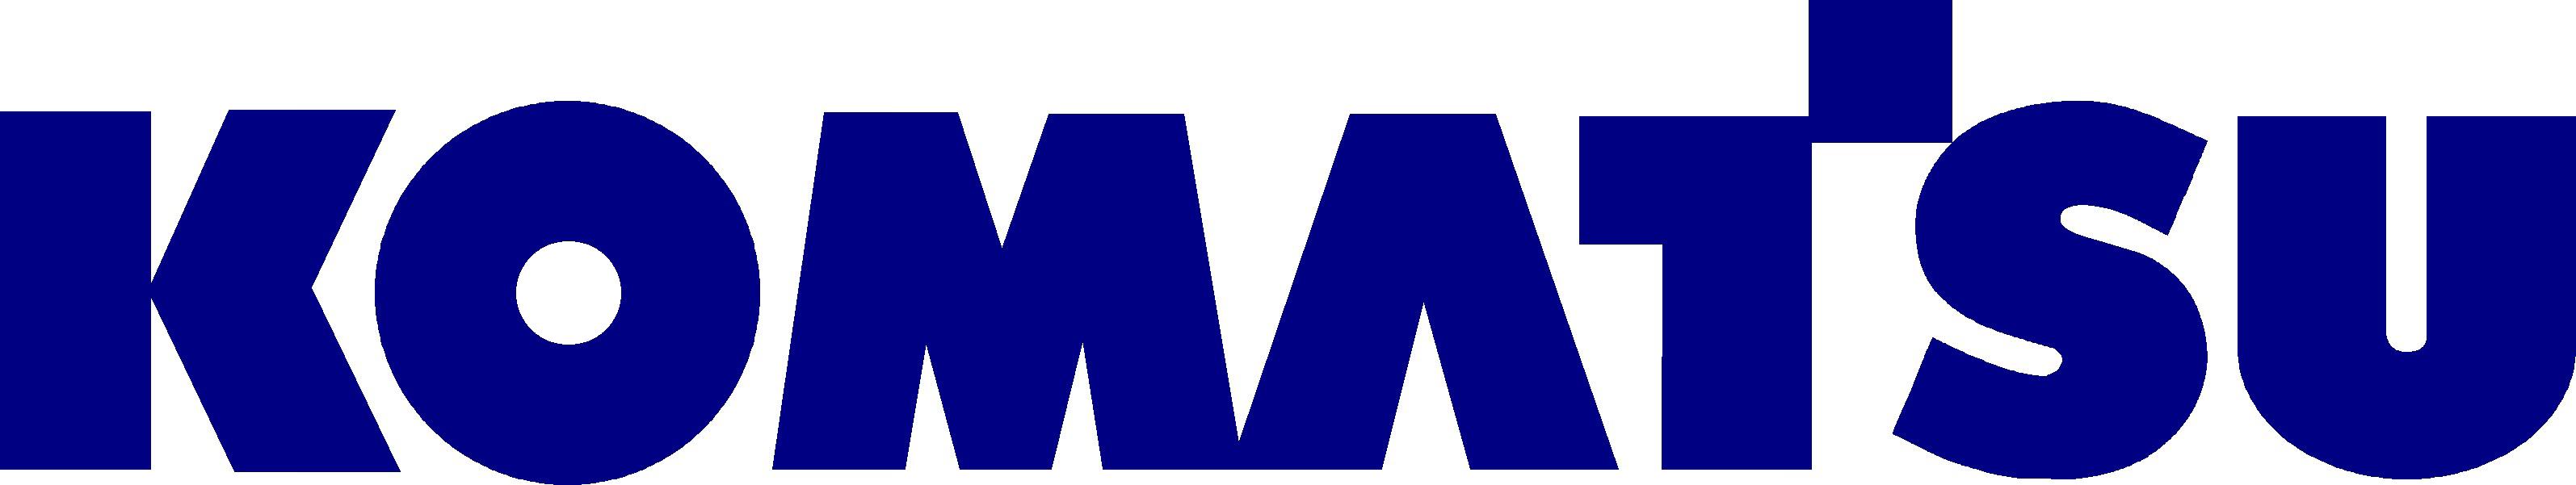 Komatsu Dsseldorf Benefits From A New Engineering Concept Wiring Harness Logo